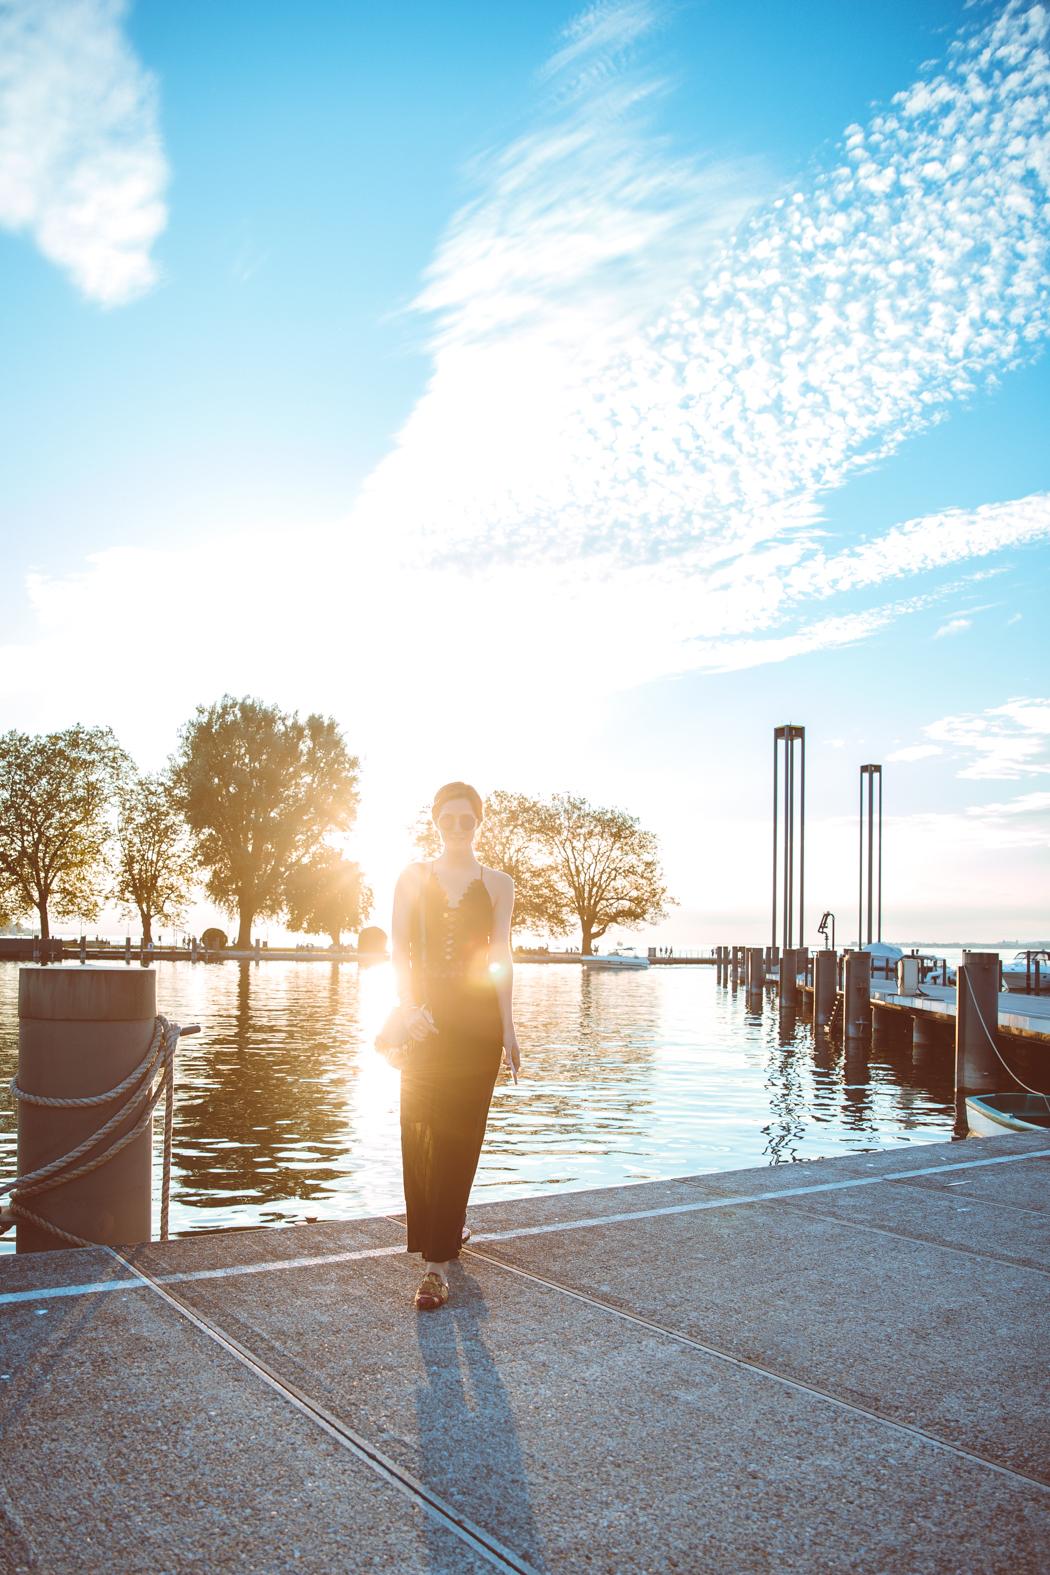 Fashionblog-Fashionblogger-Fashion-Blog-Modeblog-Mode-Muenchen-Deutschland-Lindarella-Chloe_Hudson-Gentle_Monster-Sunglasses-Sonnenbrille-verspiegelt-lila-5